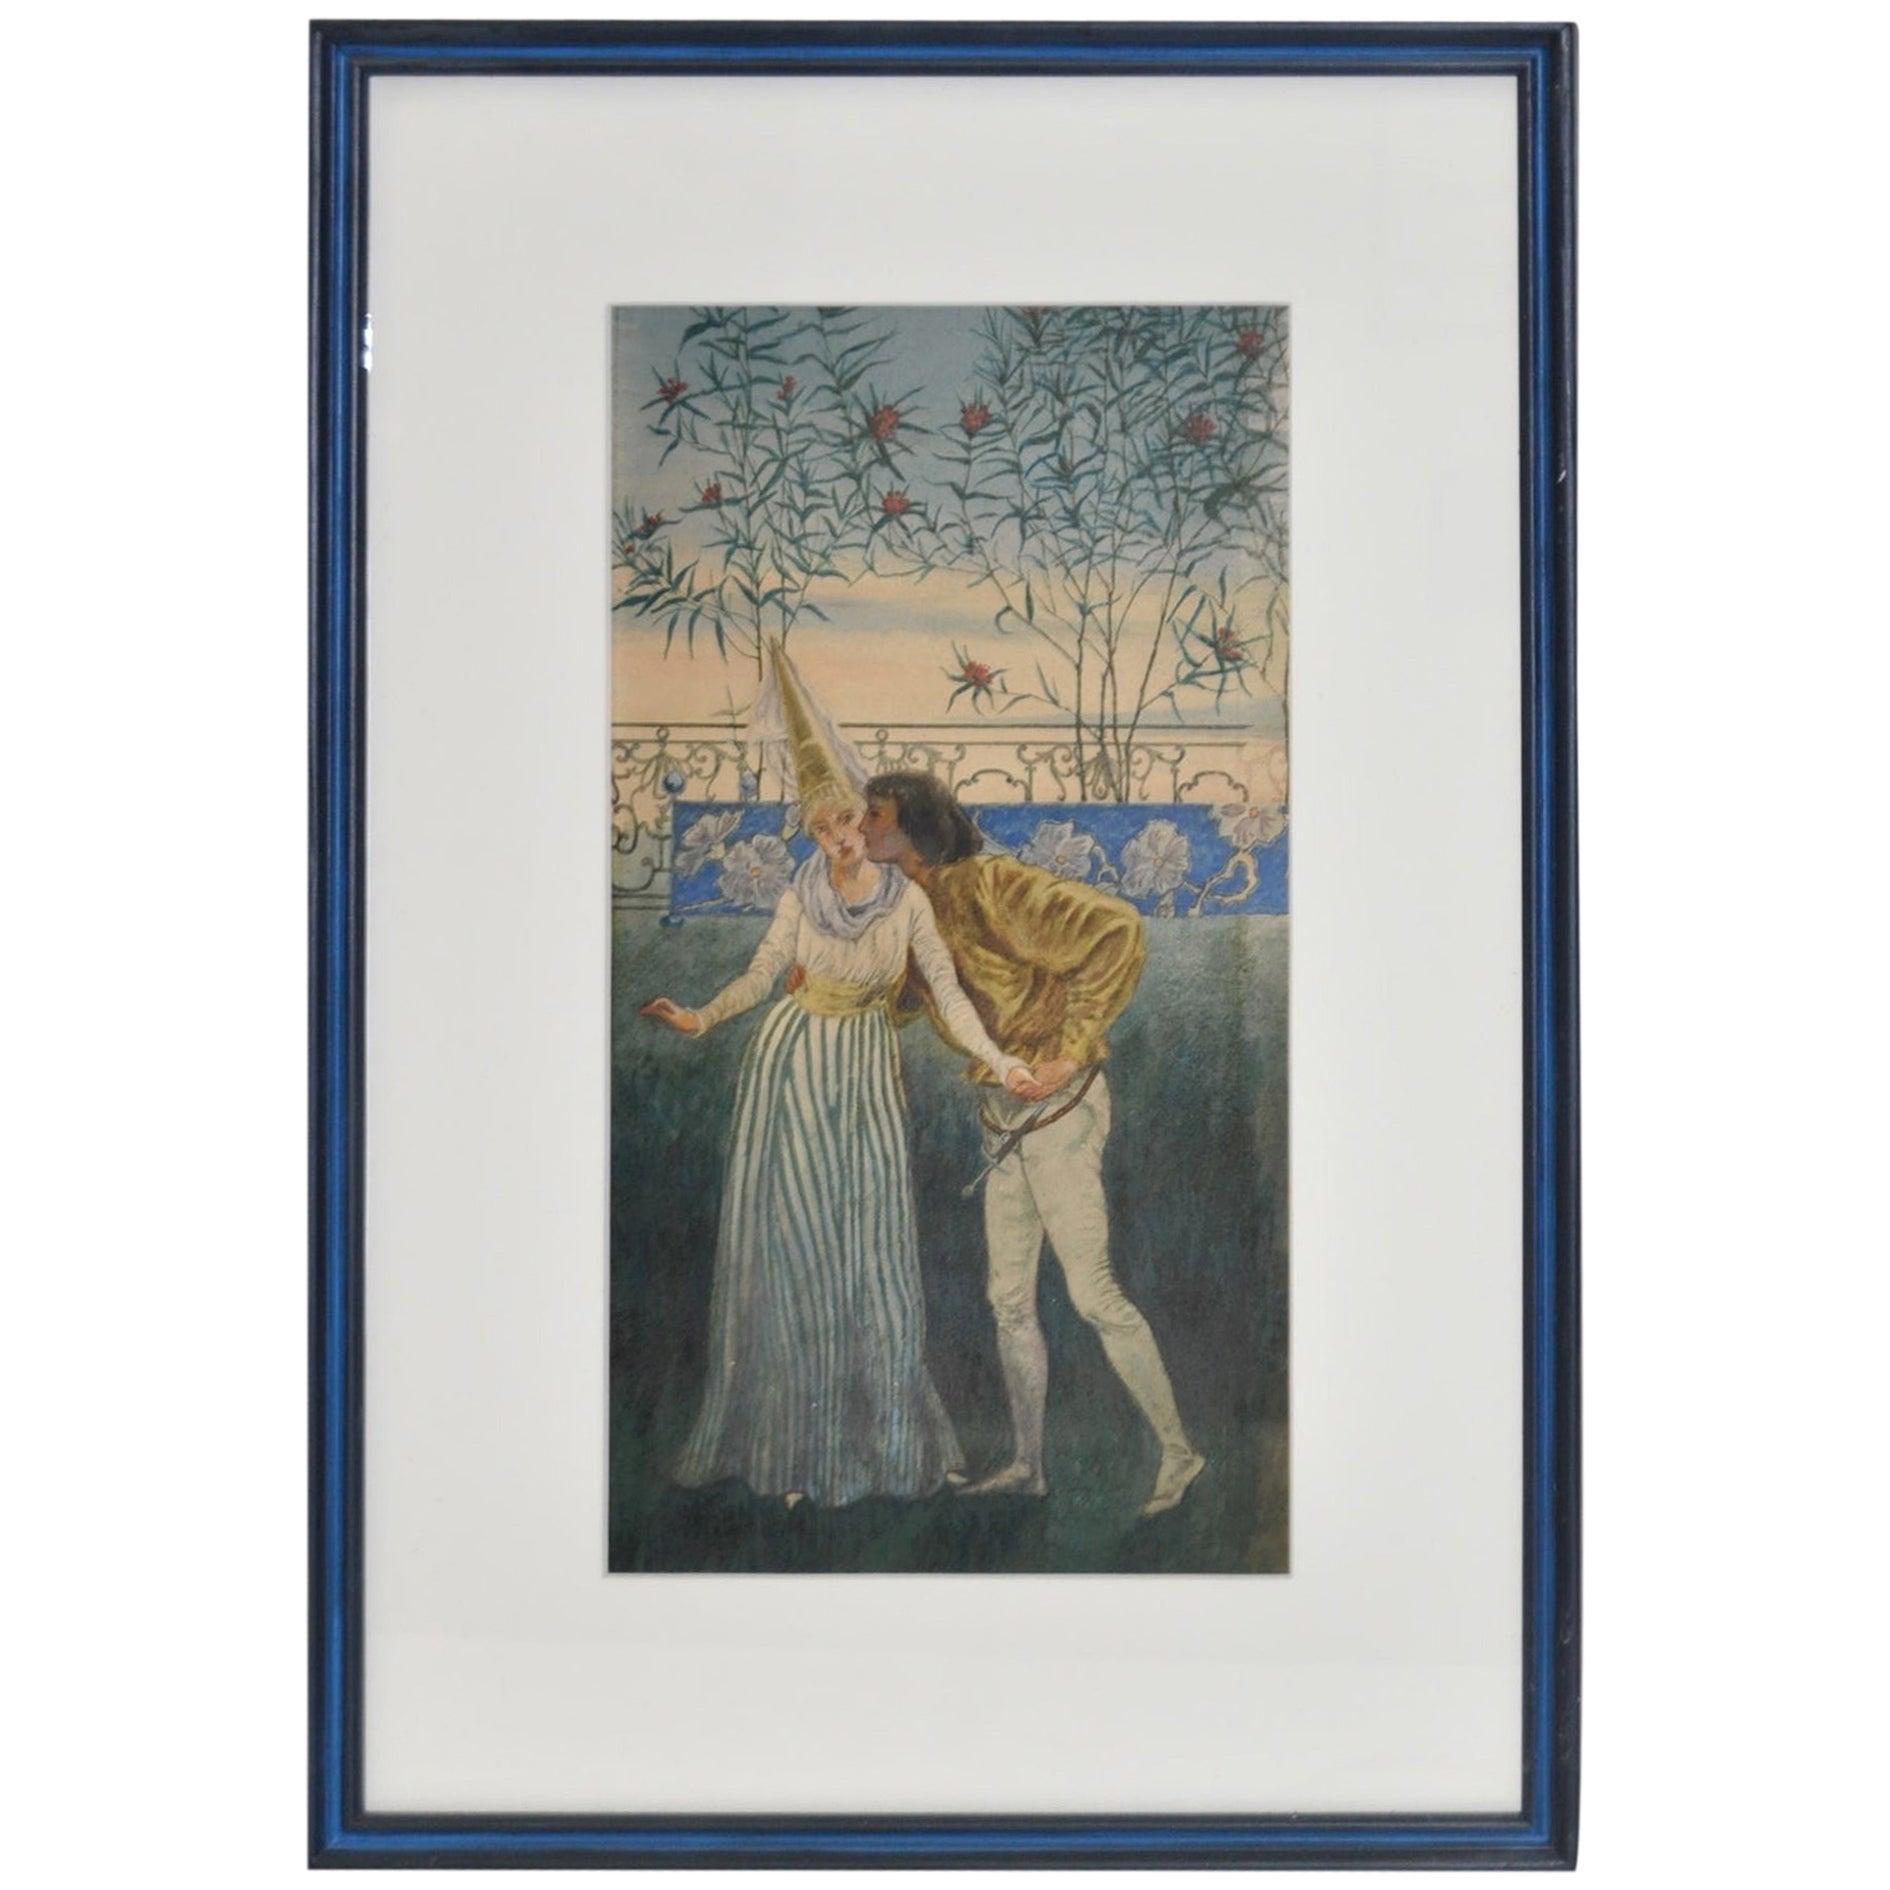 Romeo and Juliette Watercolor by Liam Watson, circa 1910